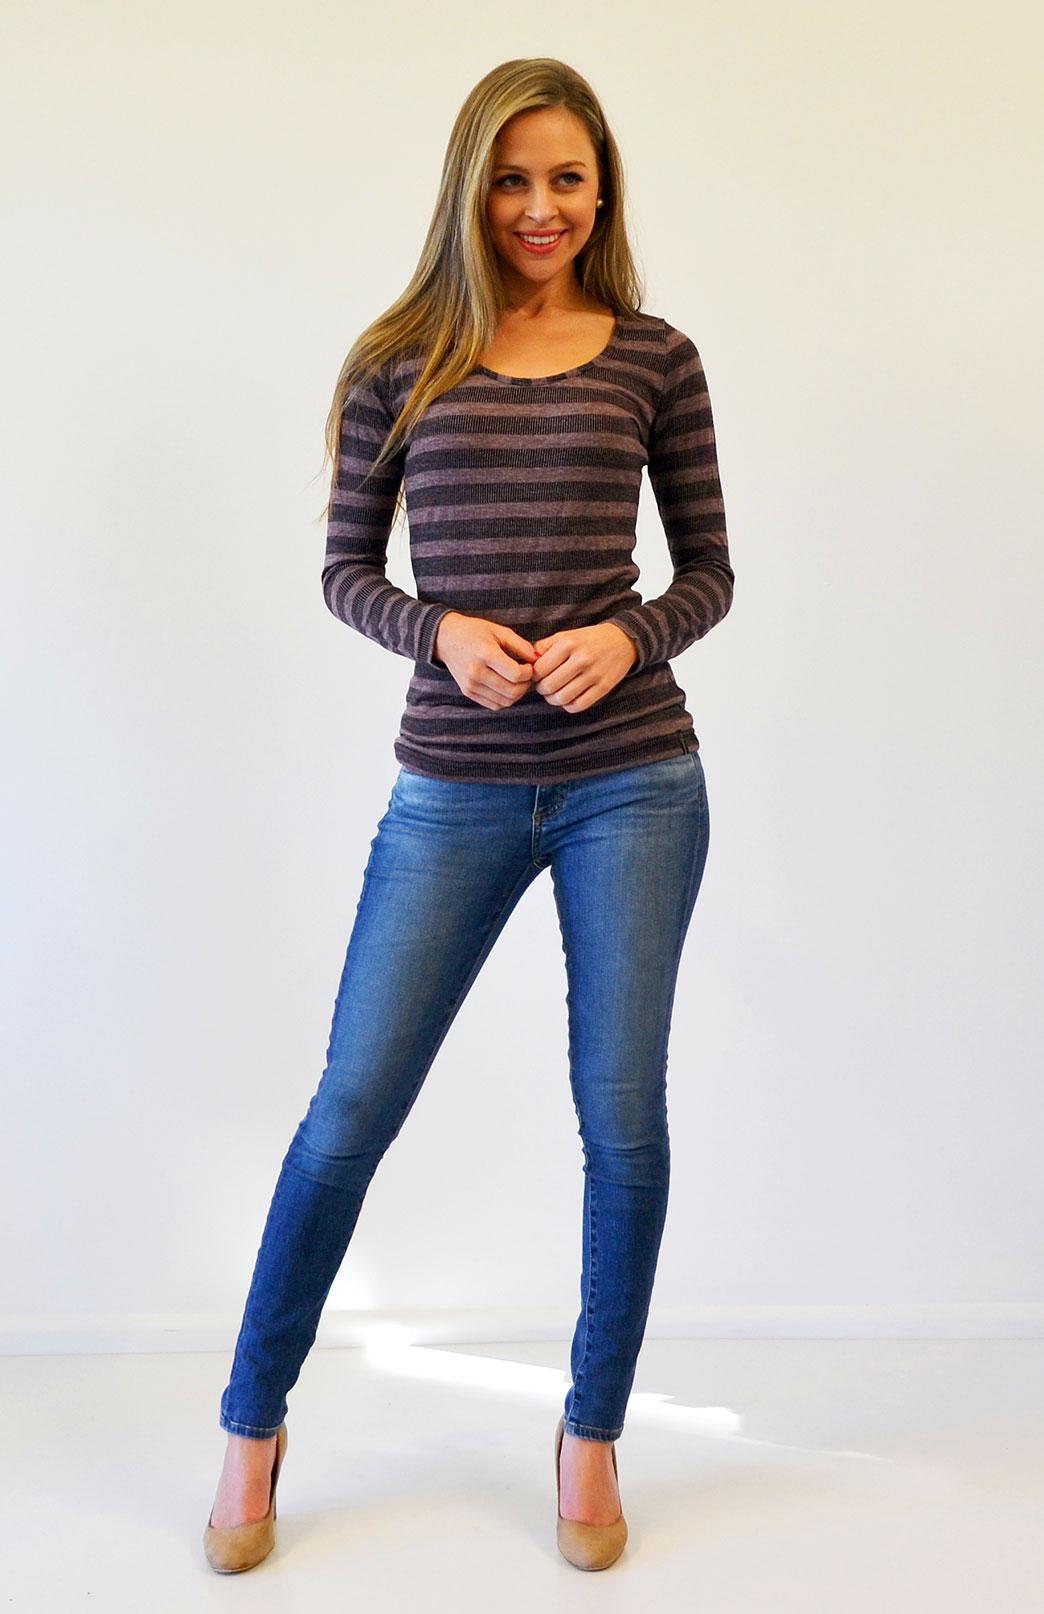 Scoop Neck Top - Patterned - Women's Raisin Stripe Merino Wool Blend Long Sleeved Scoop Neck Top - Smitten Merino Tasmania Australia